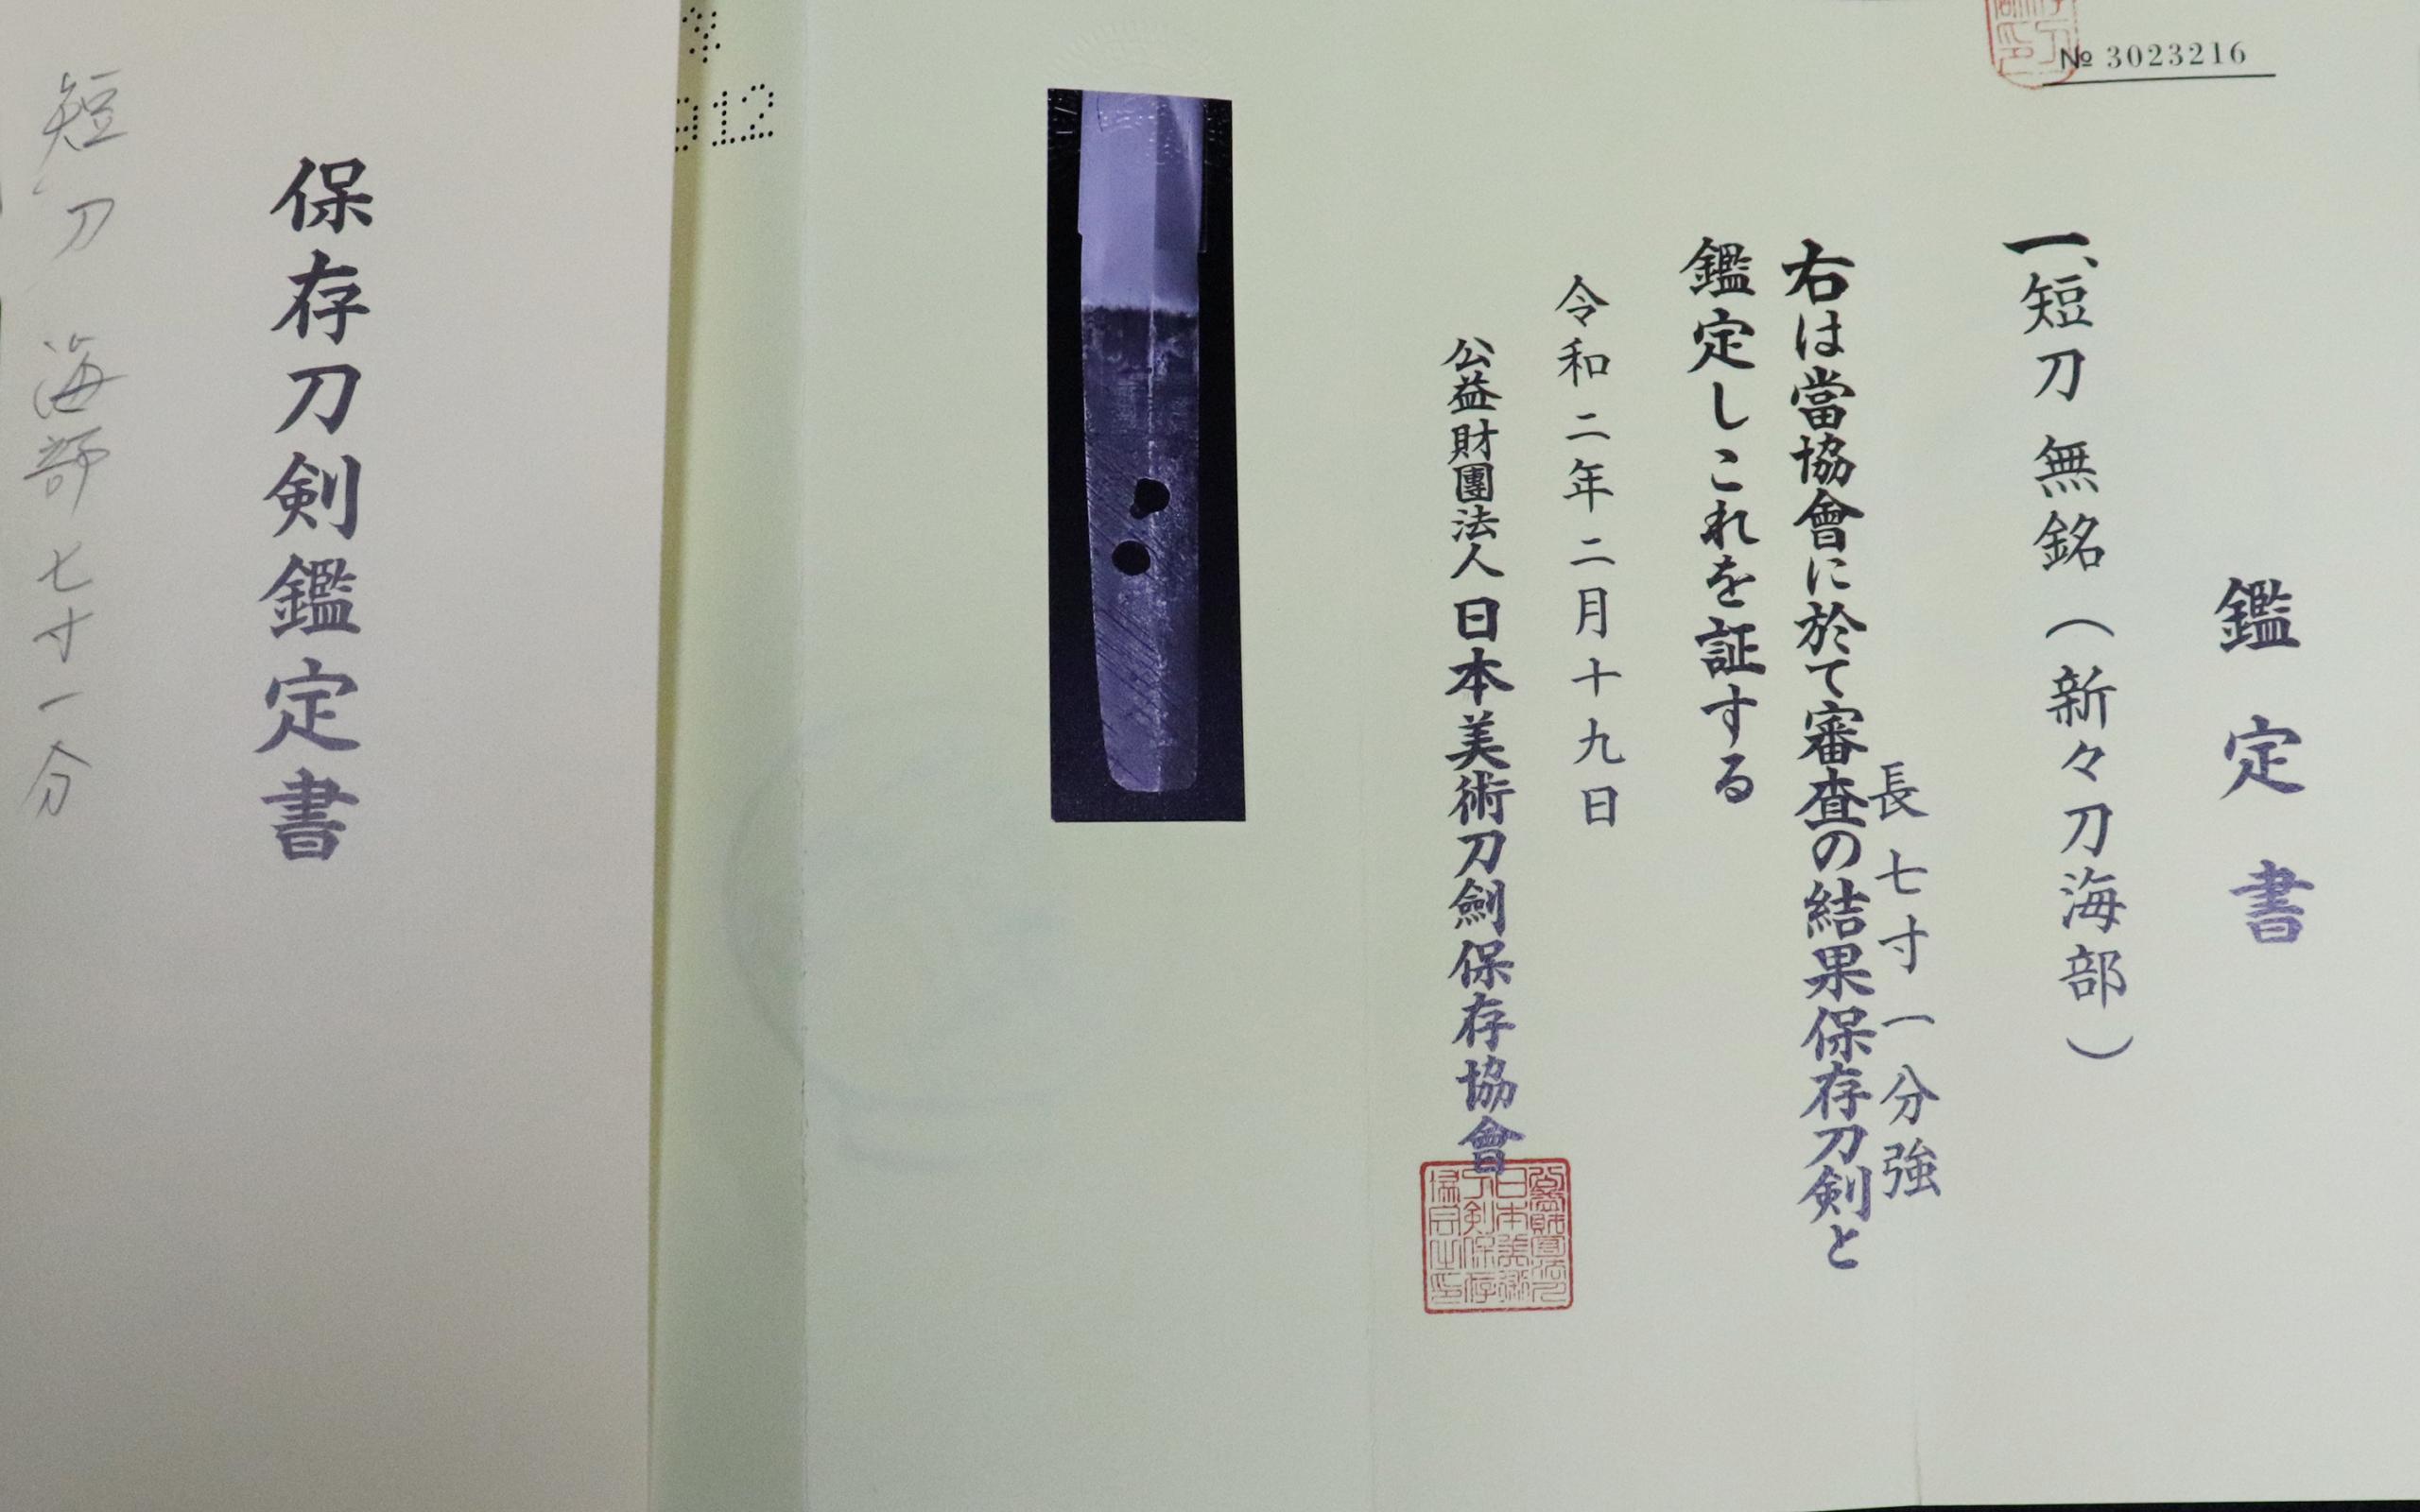 01-400